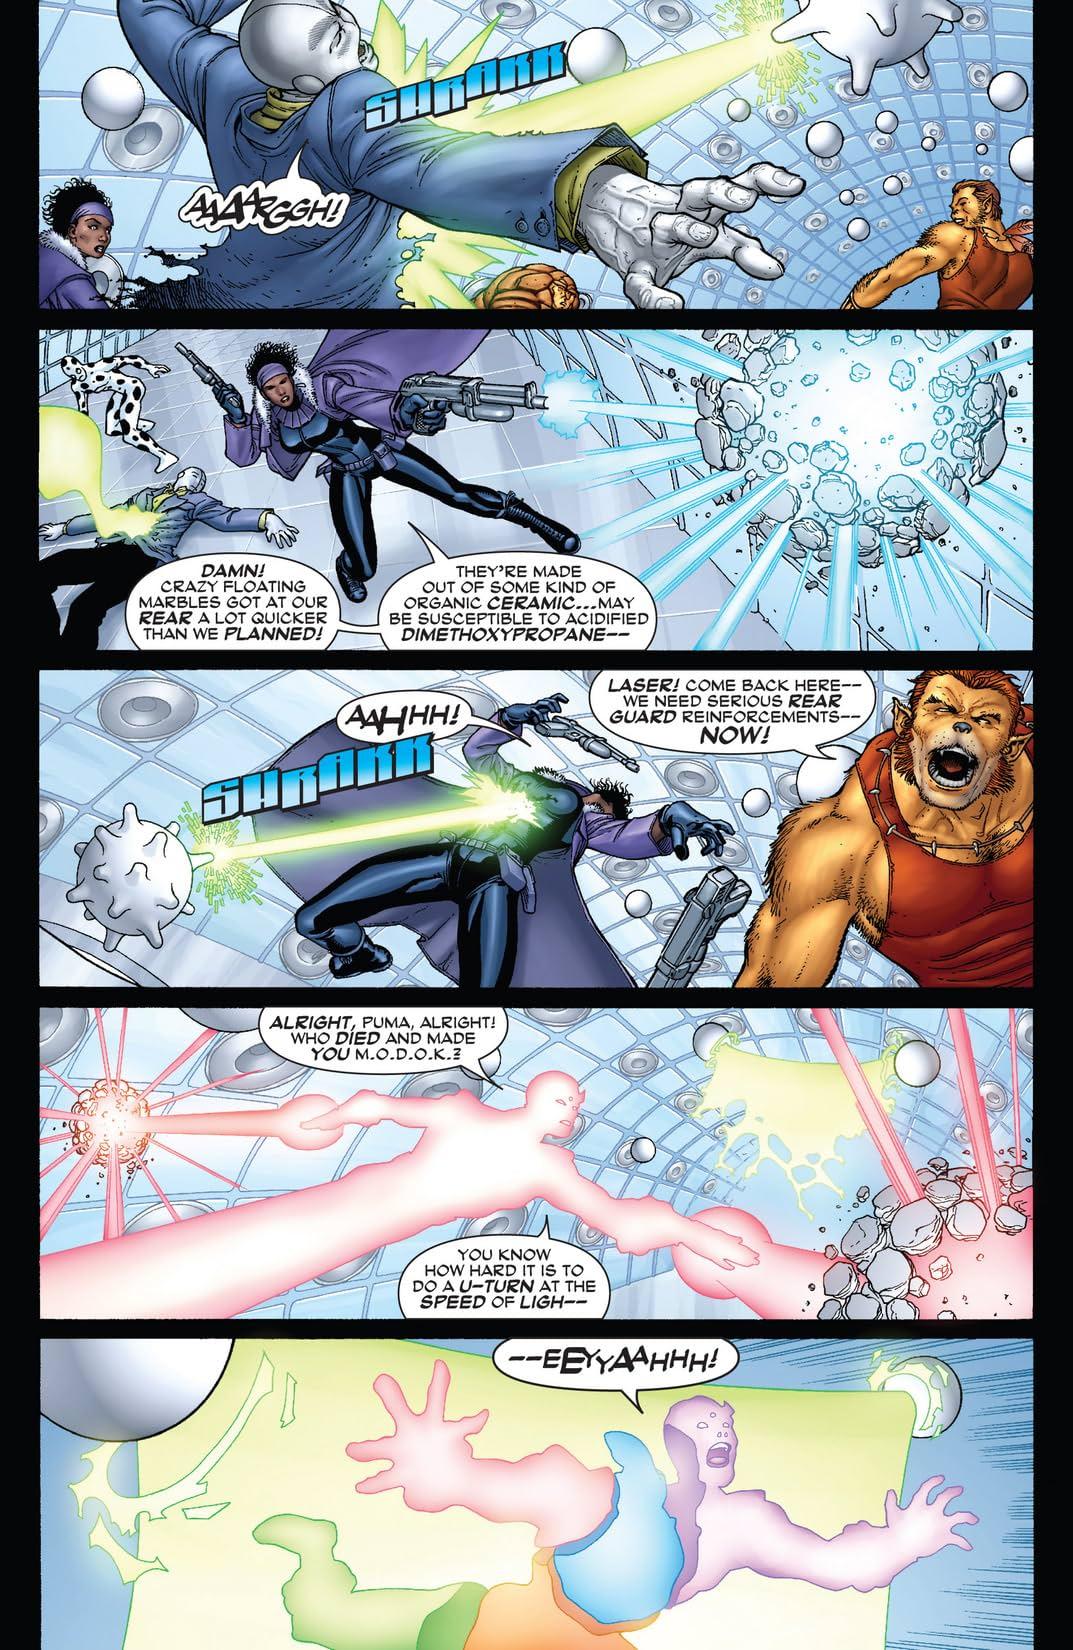 Super-Villain Team-Up/M.O.D.O.K.'s 11 #2 (of 5)